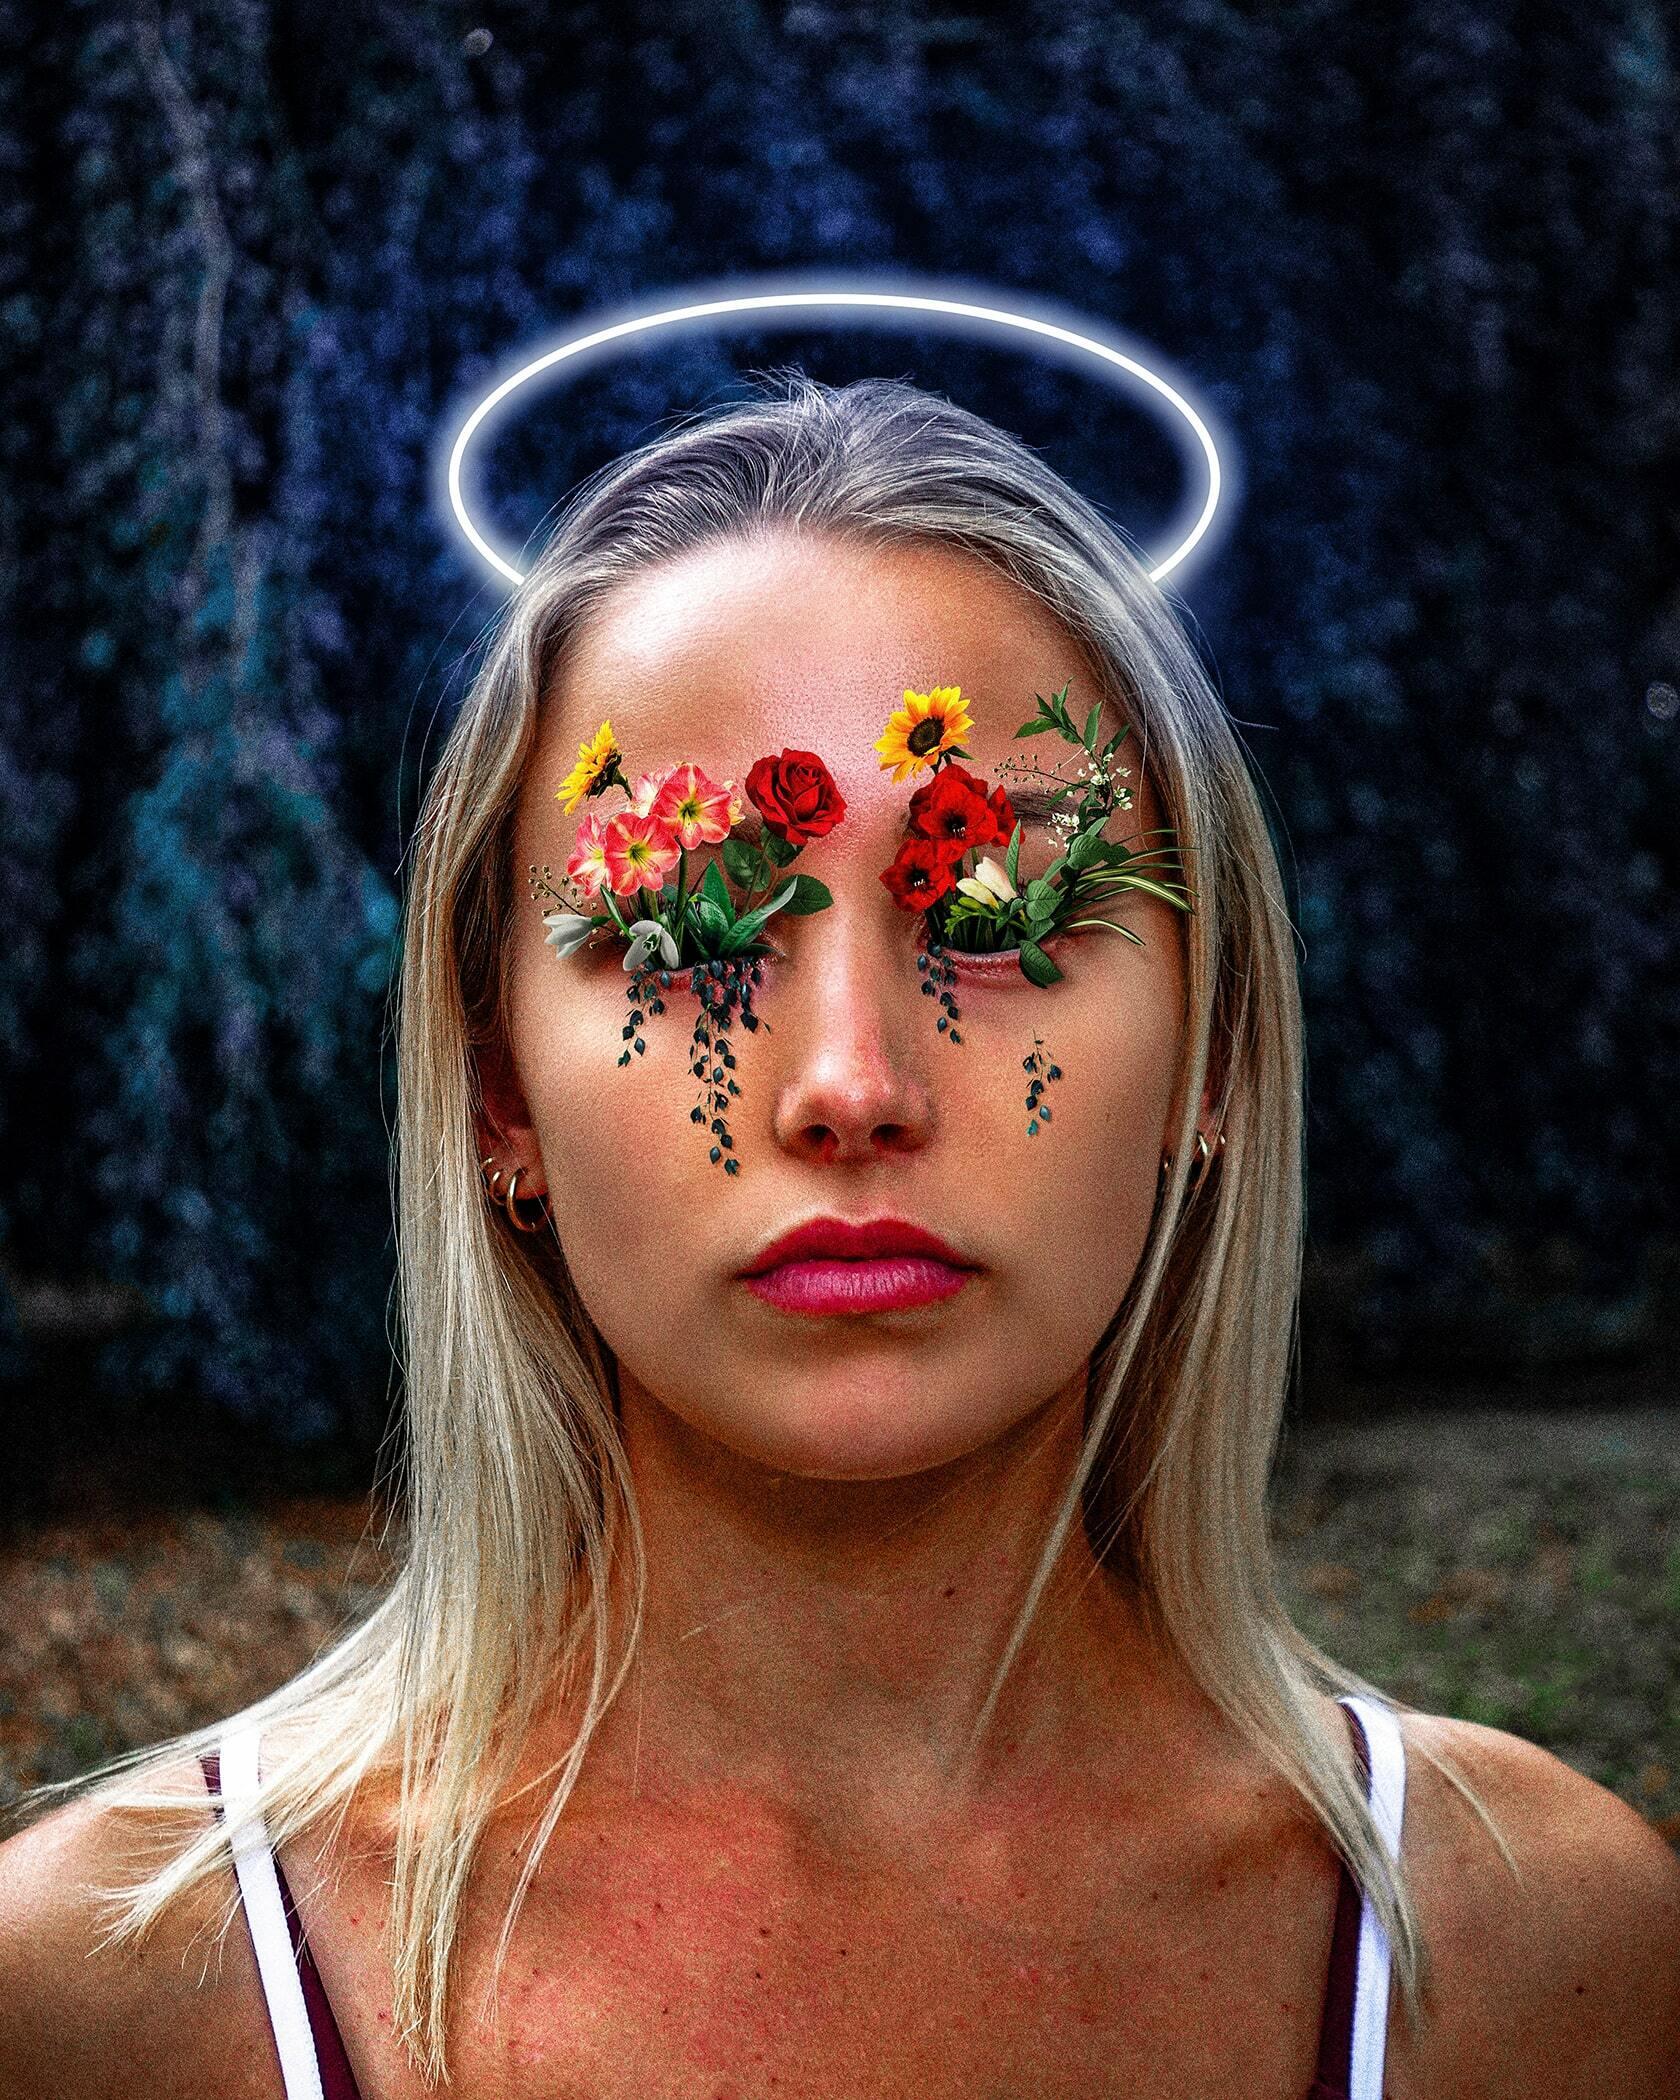 Digital art project abstract portraits ontwerp Flowers